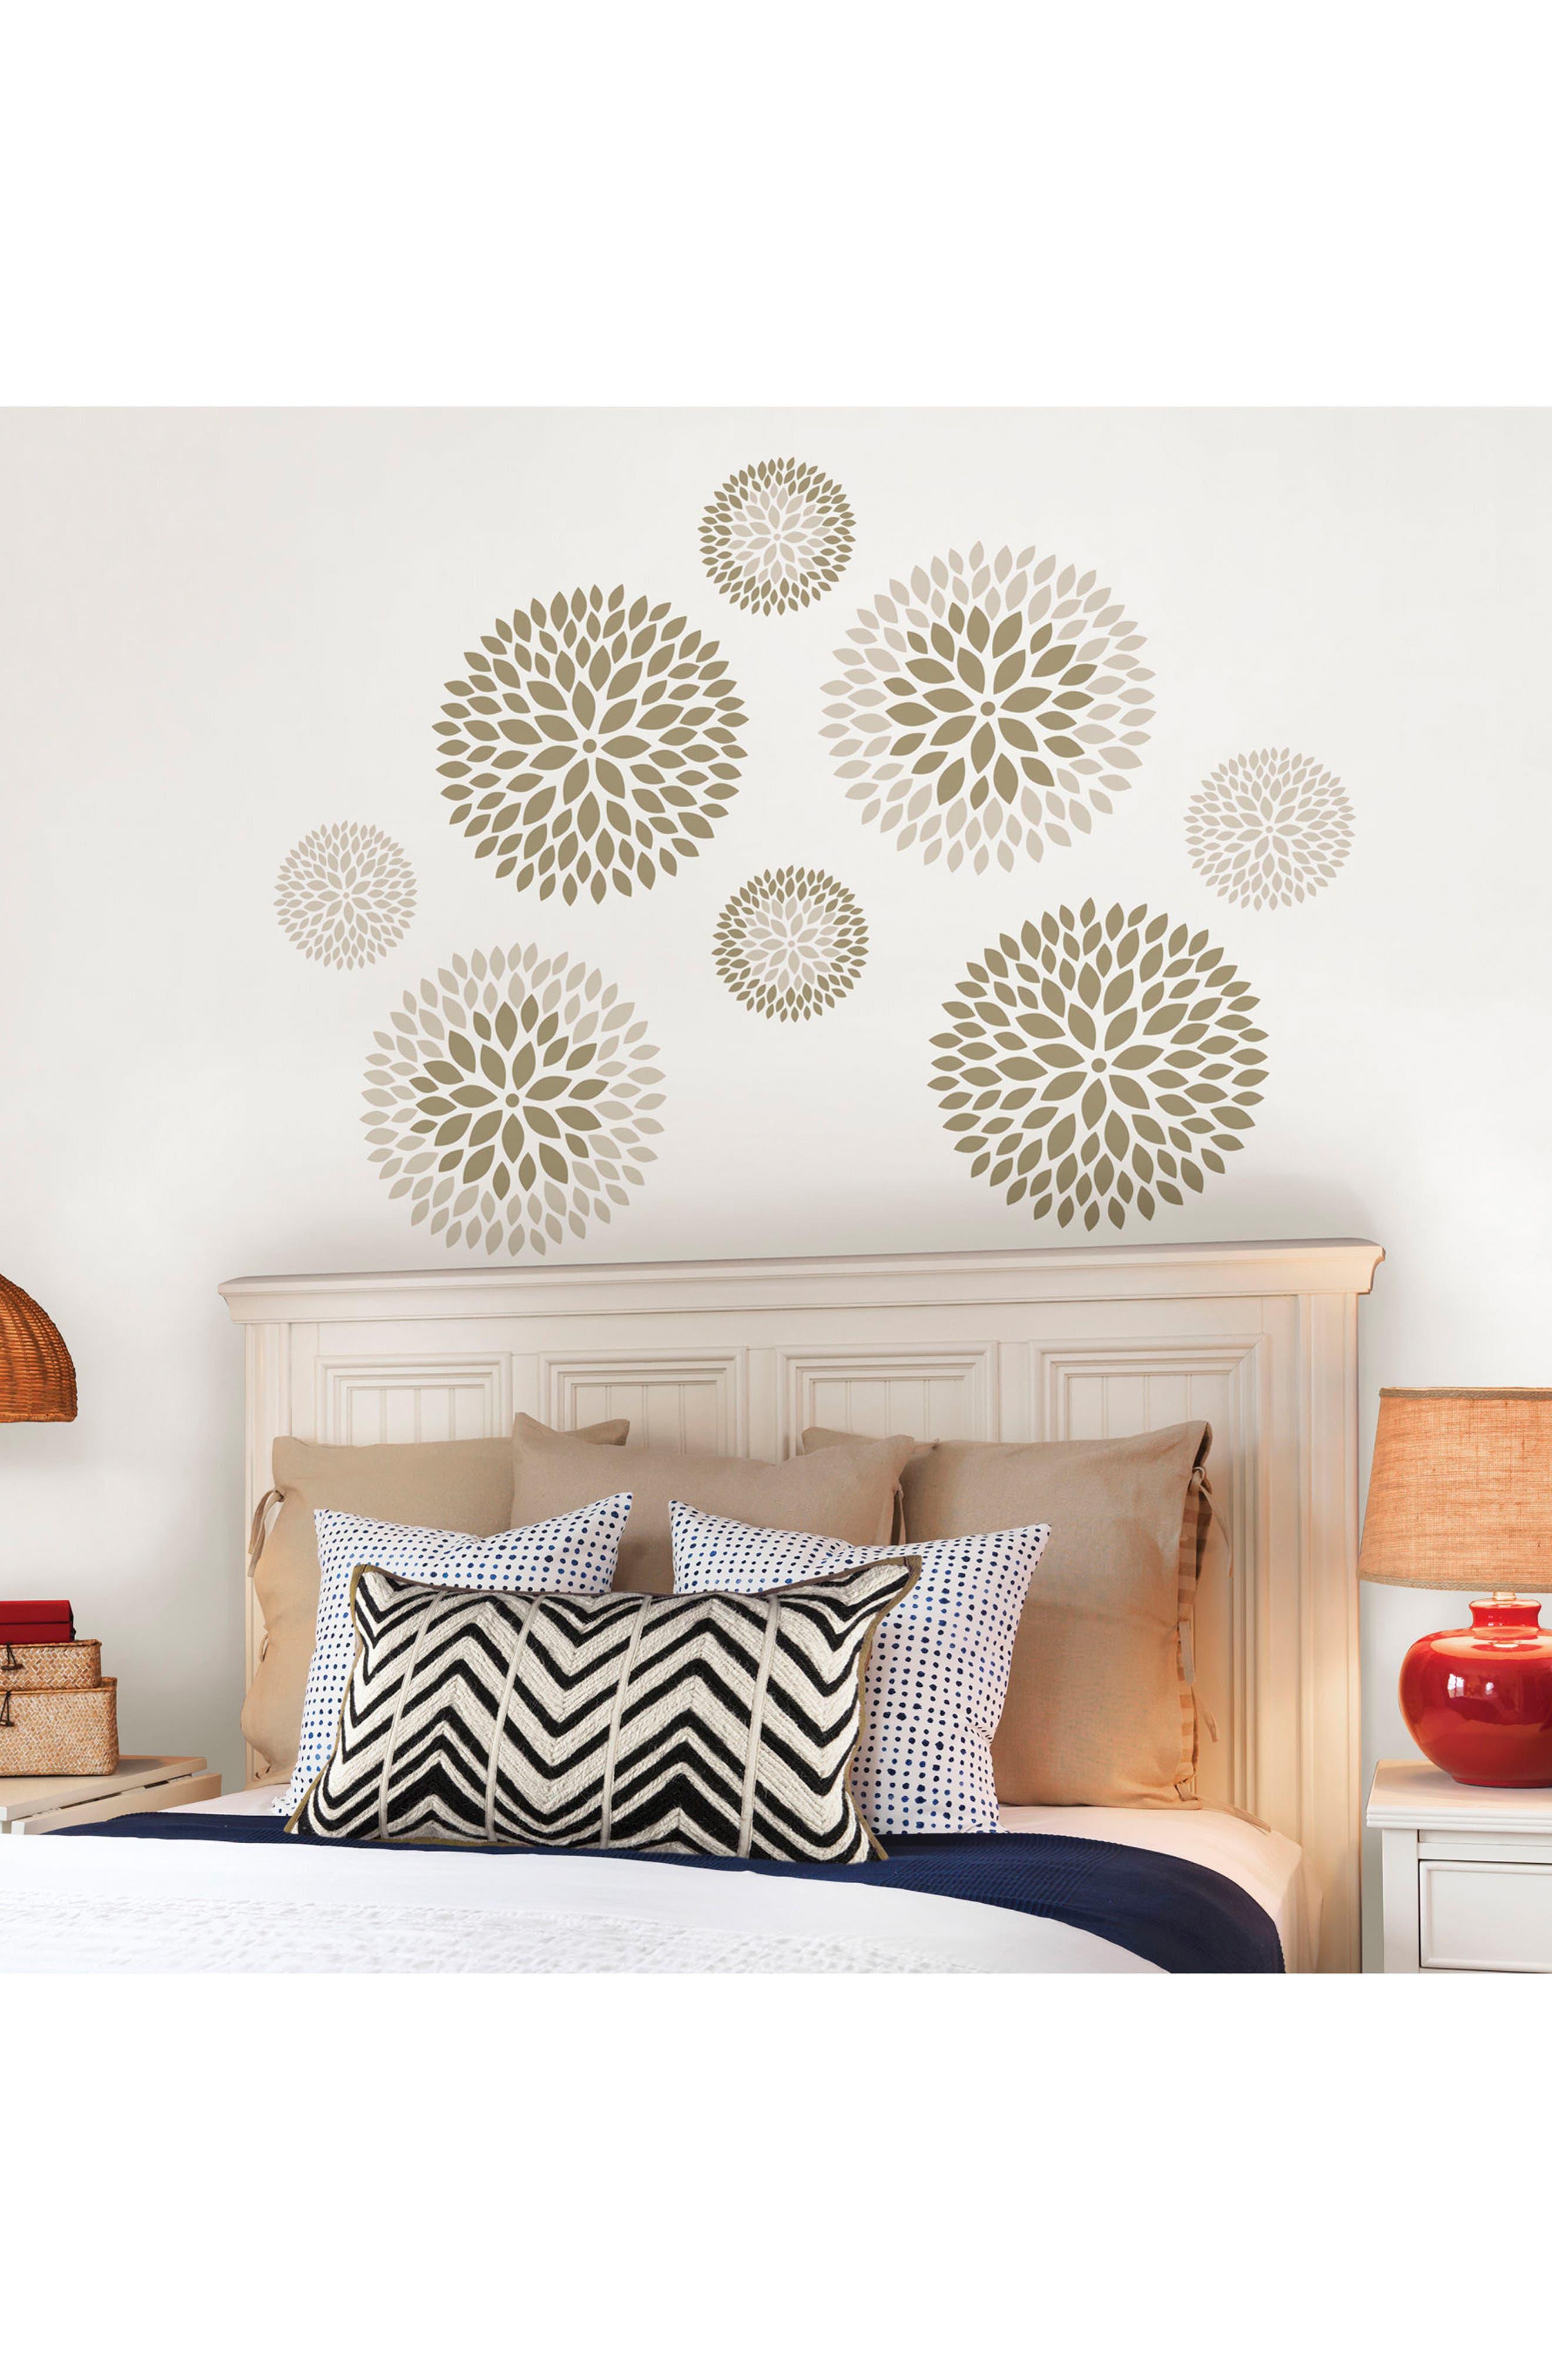 Chrysanthemum 8-Piece Wall Art Decal Set,                             Alternate thumbnail 2, color,                             250